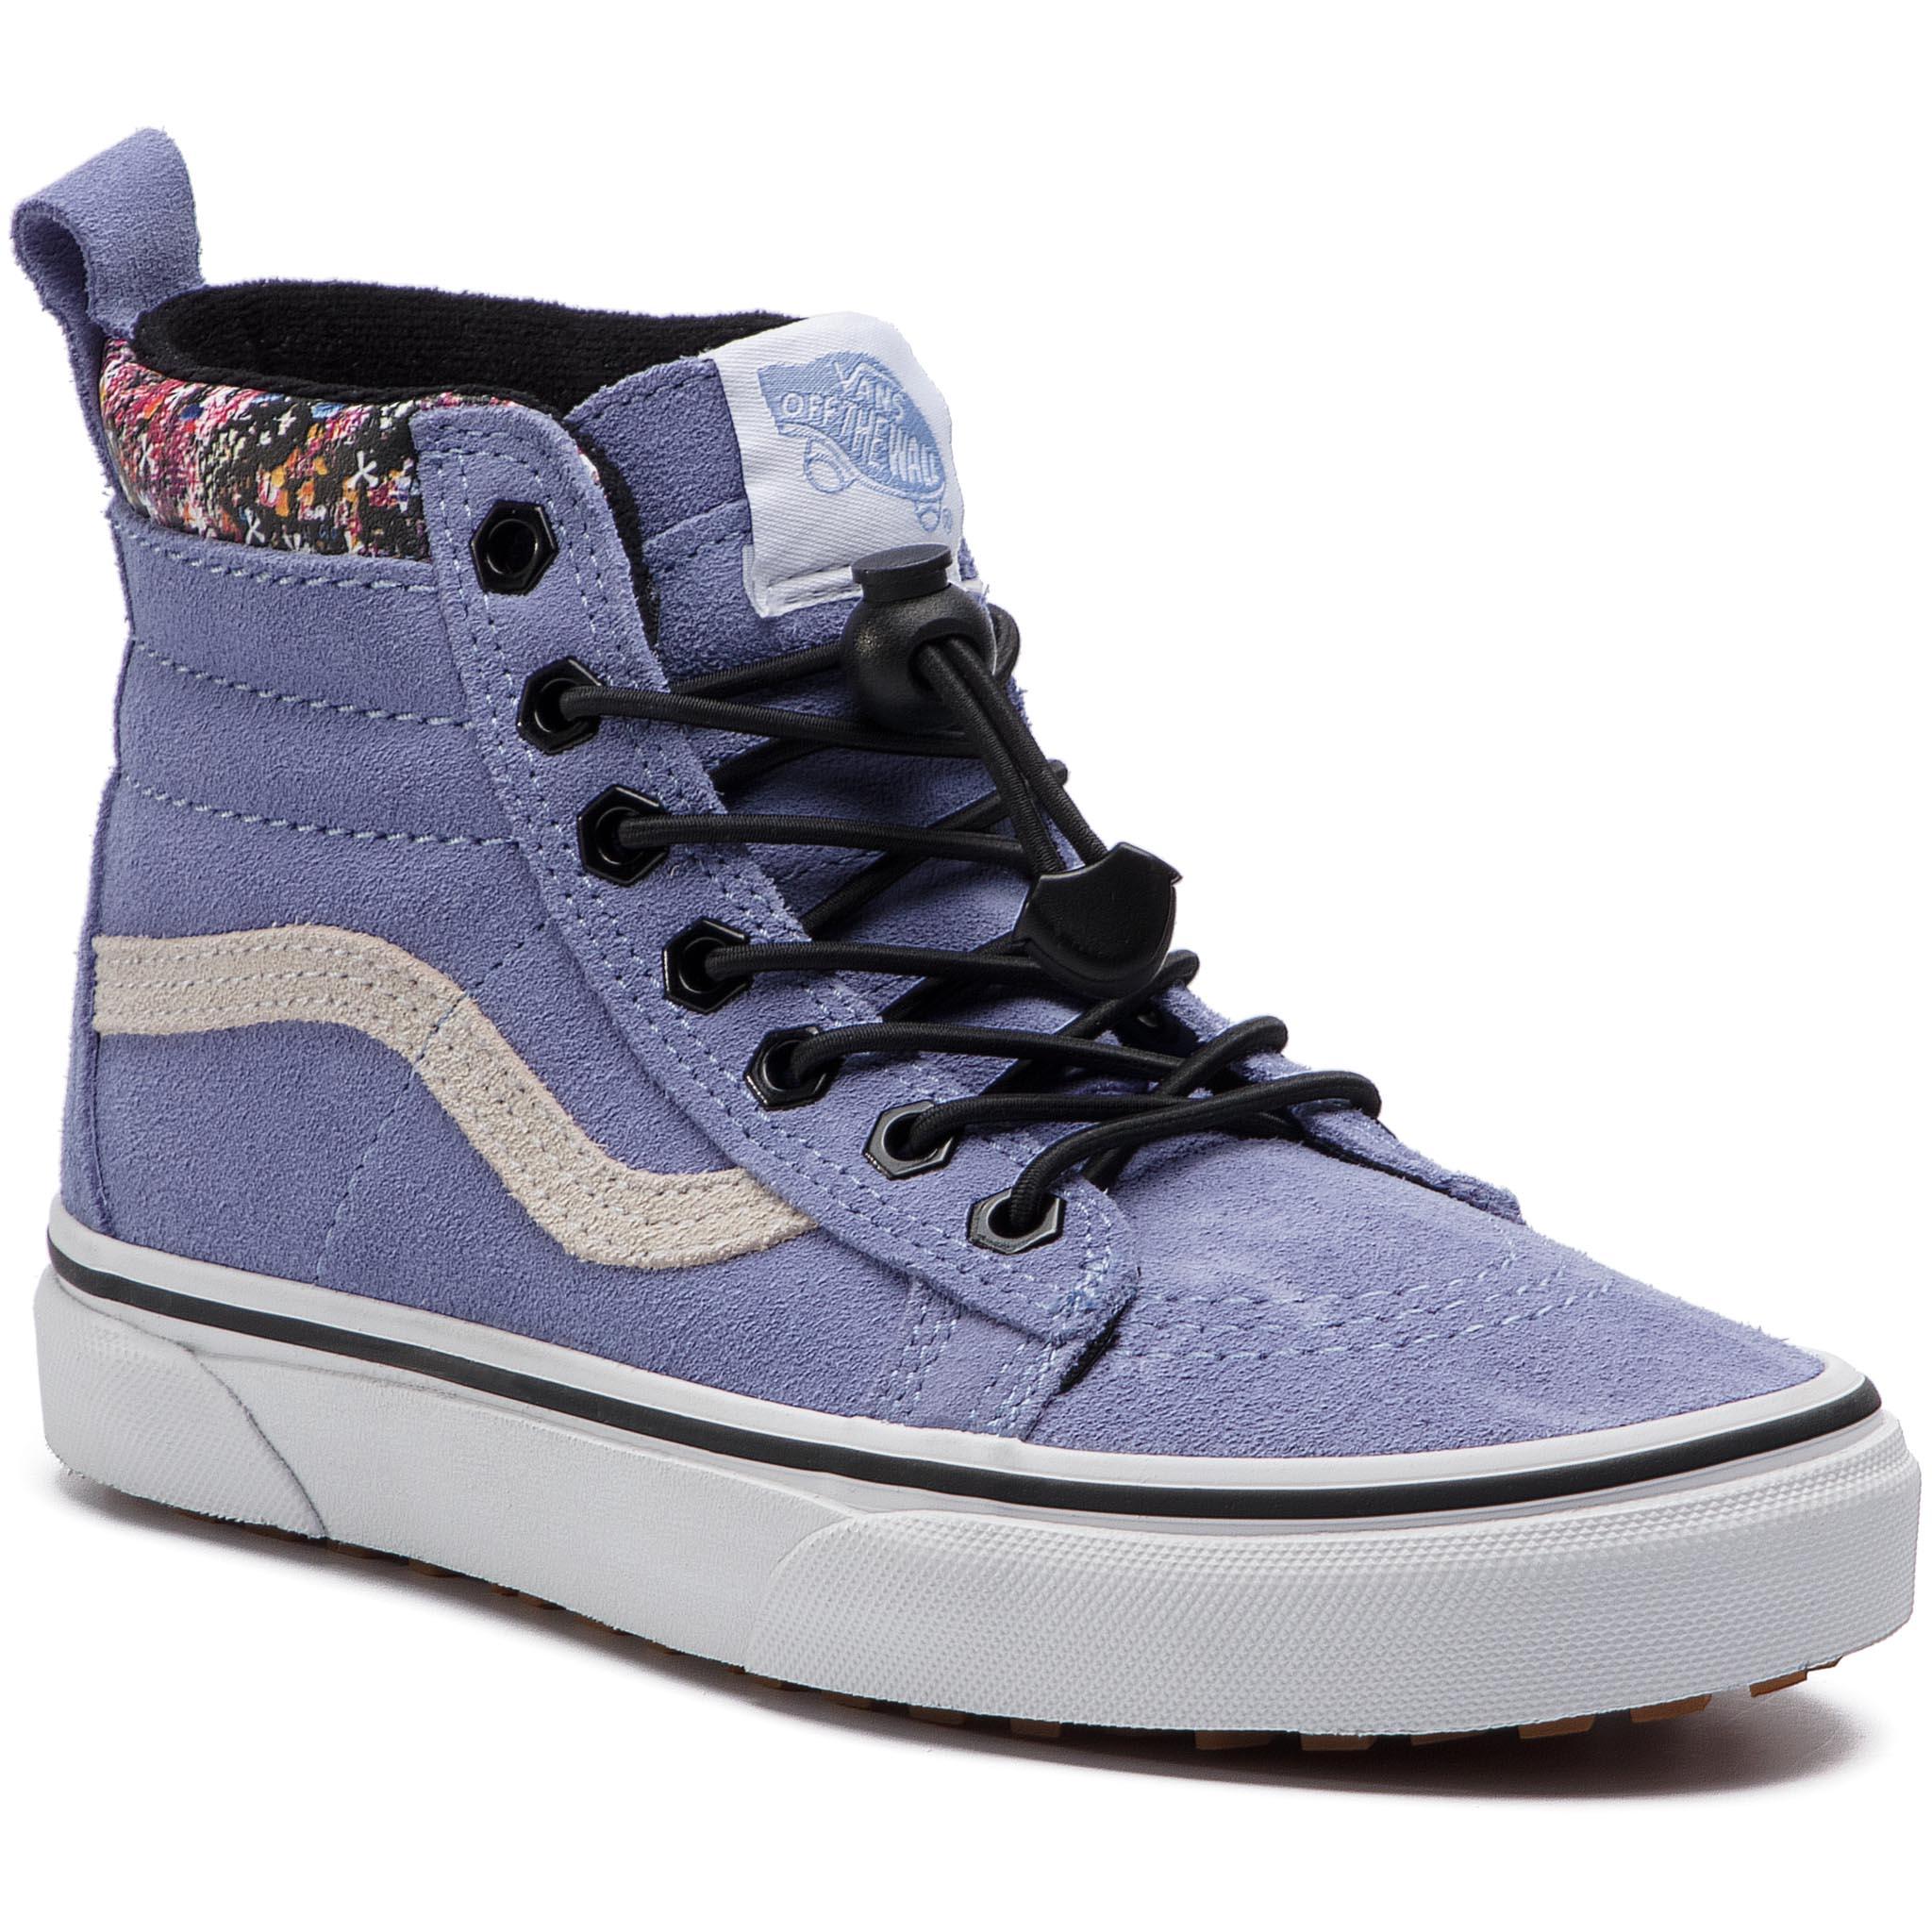 cceef415eb Sneakers VANS - Sk8-Hi Mte VN0A33TXUC81 (Mte) Sequoia Gum - Sneakers ...